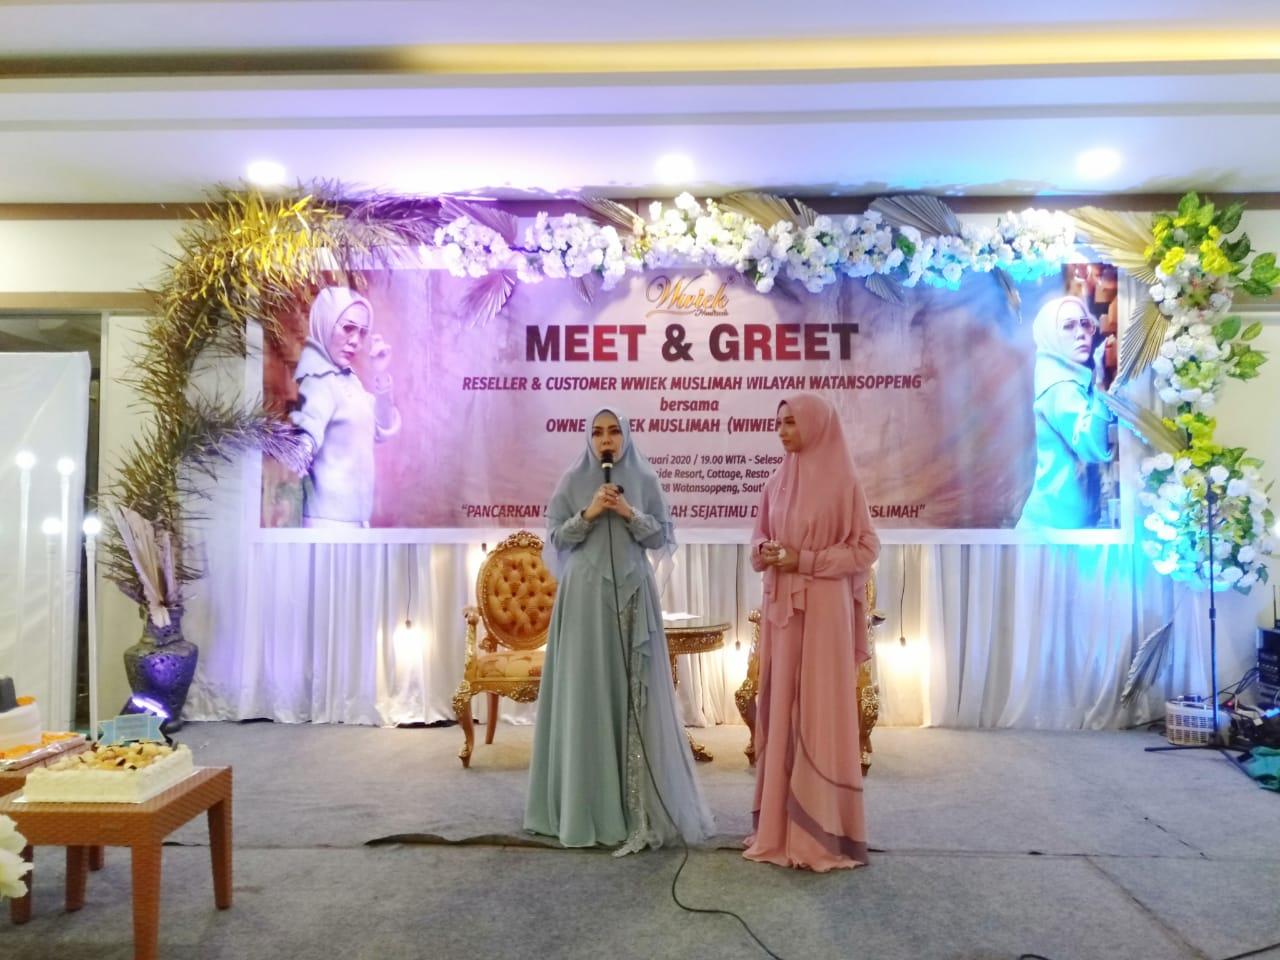 Butik Wwik Muslimah Tatap Muka Bersama Reseller dan Coustomer